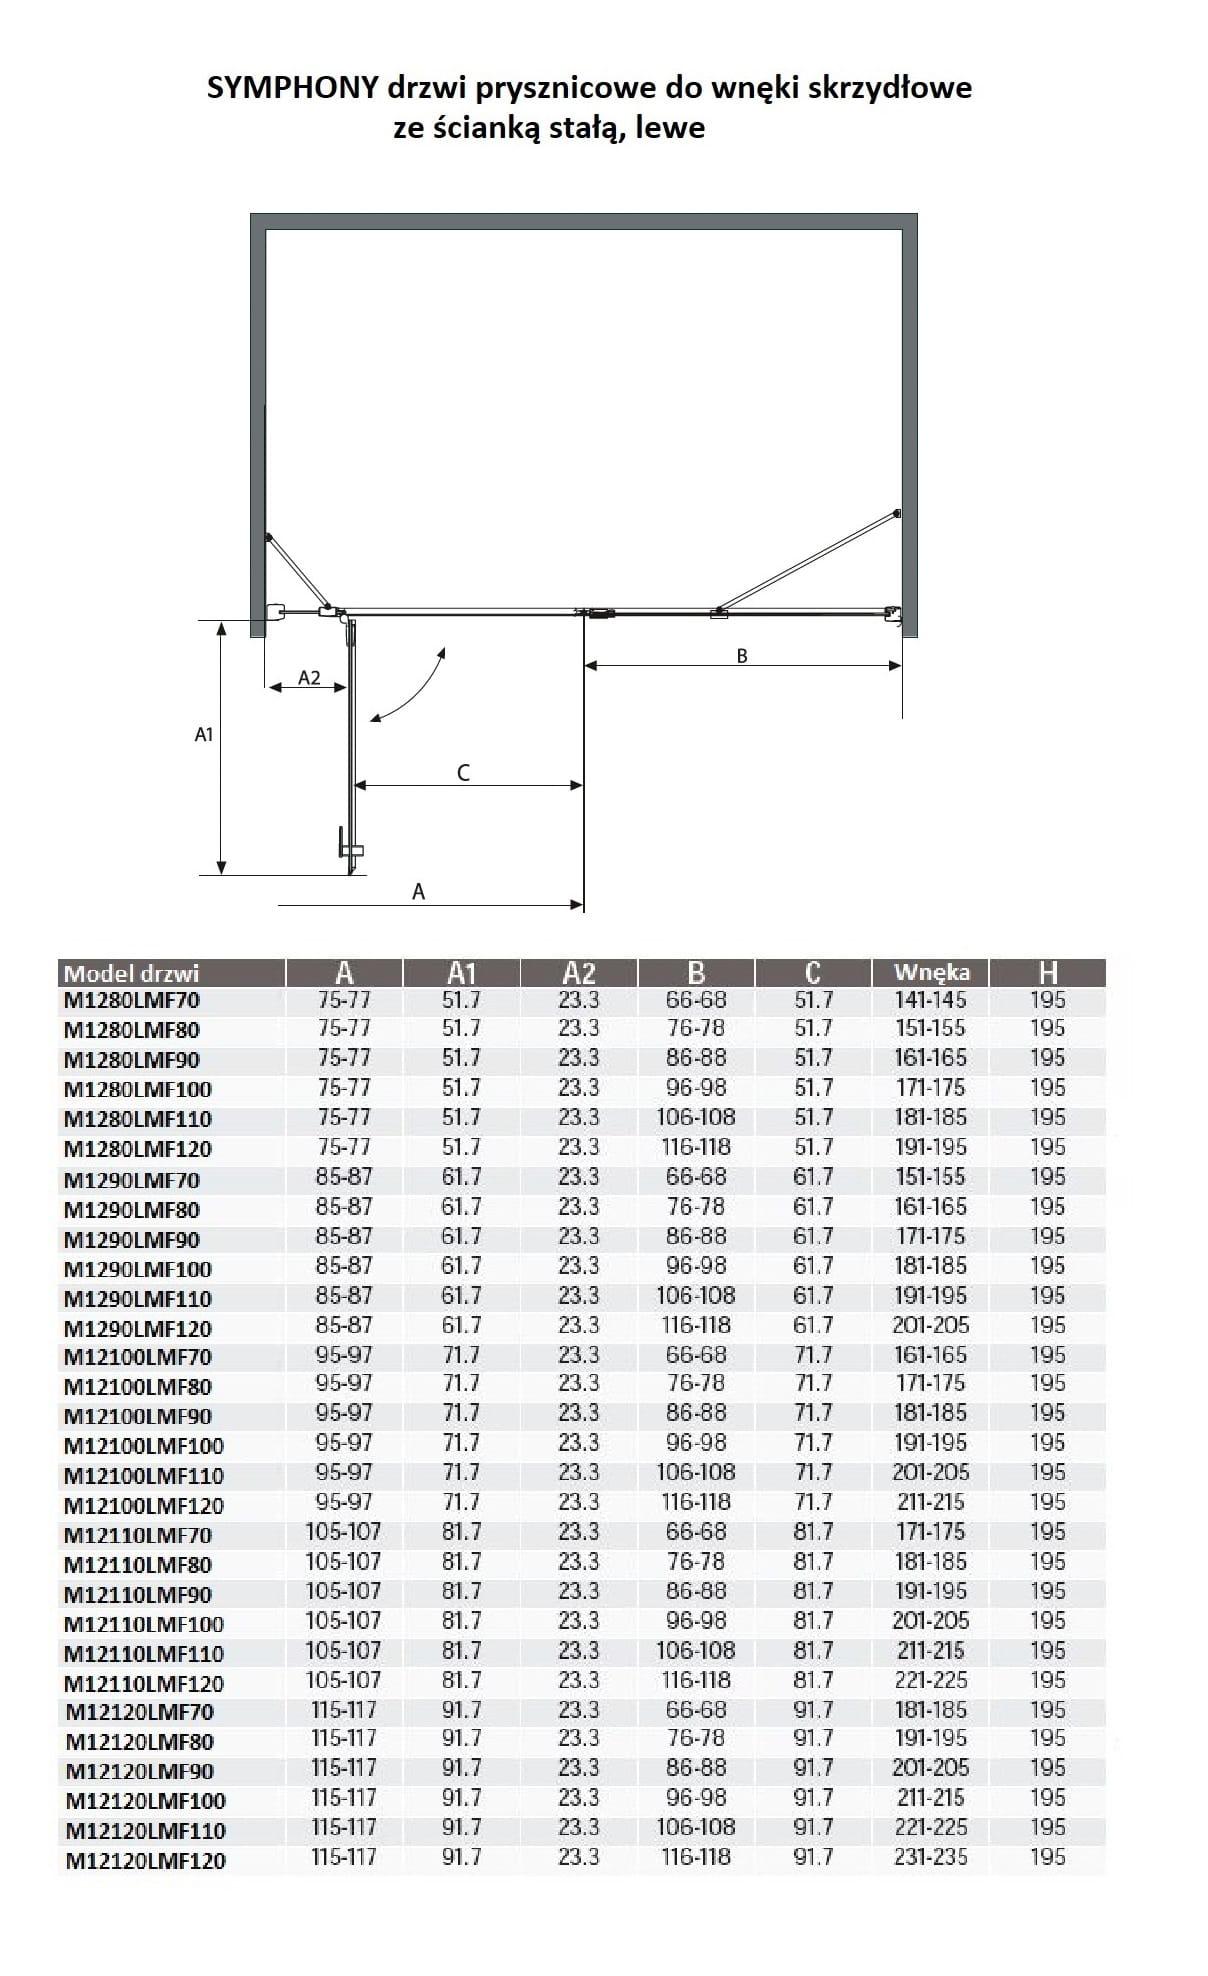 Sanotechnik - SYMPHONY - Sprchové dvere do výklenku pre krídlo, ľavé 160 x 195 cm